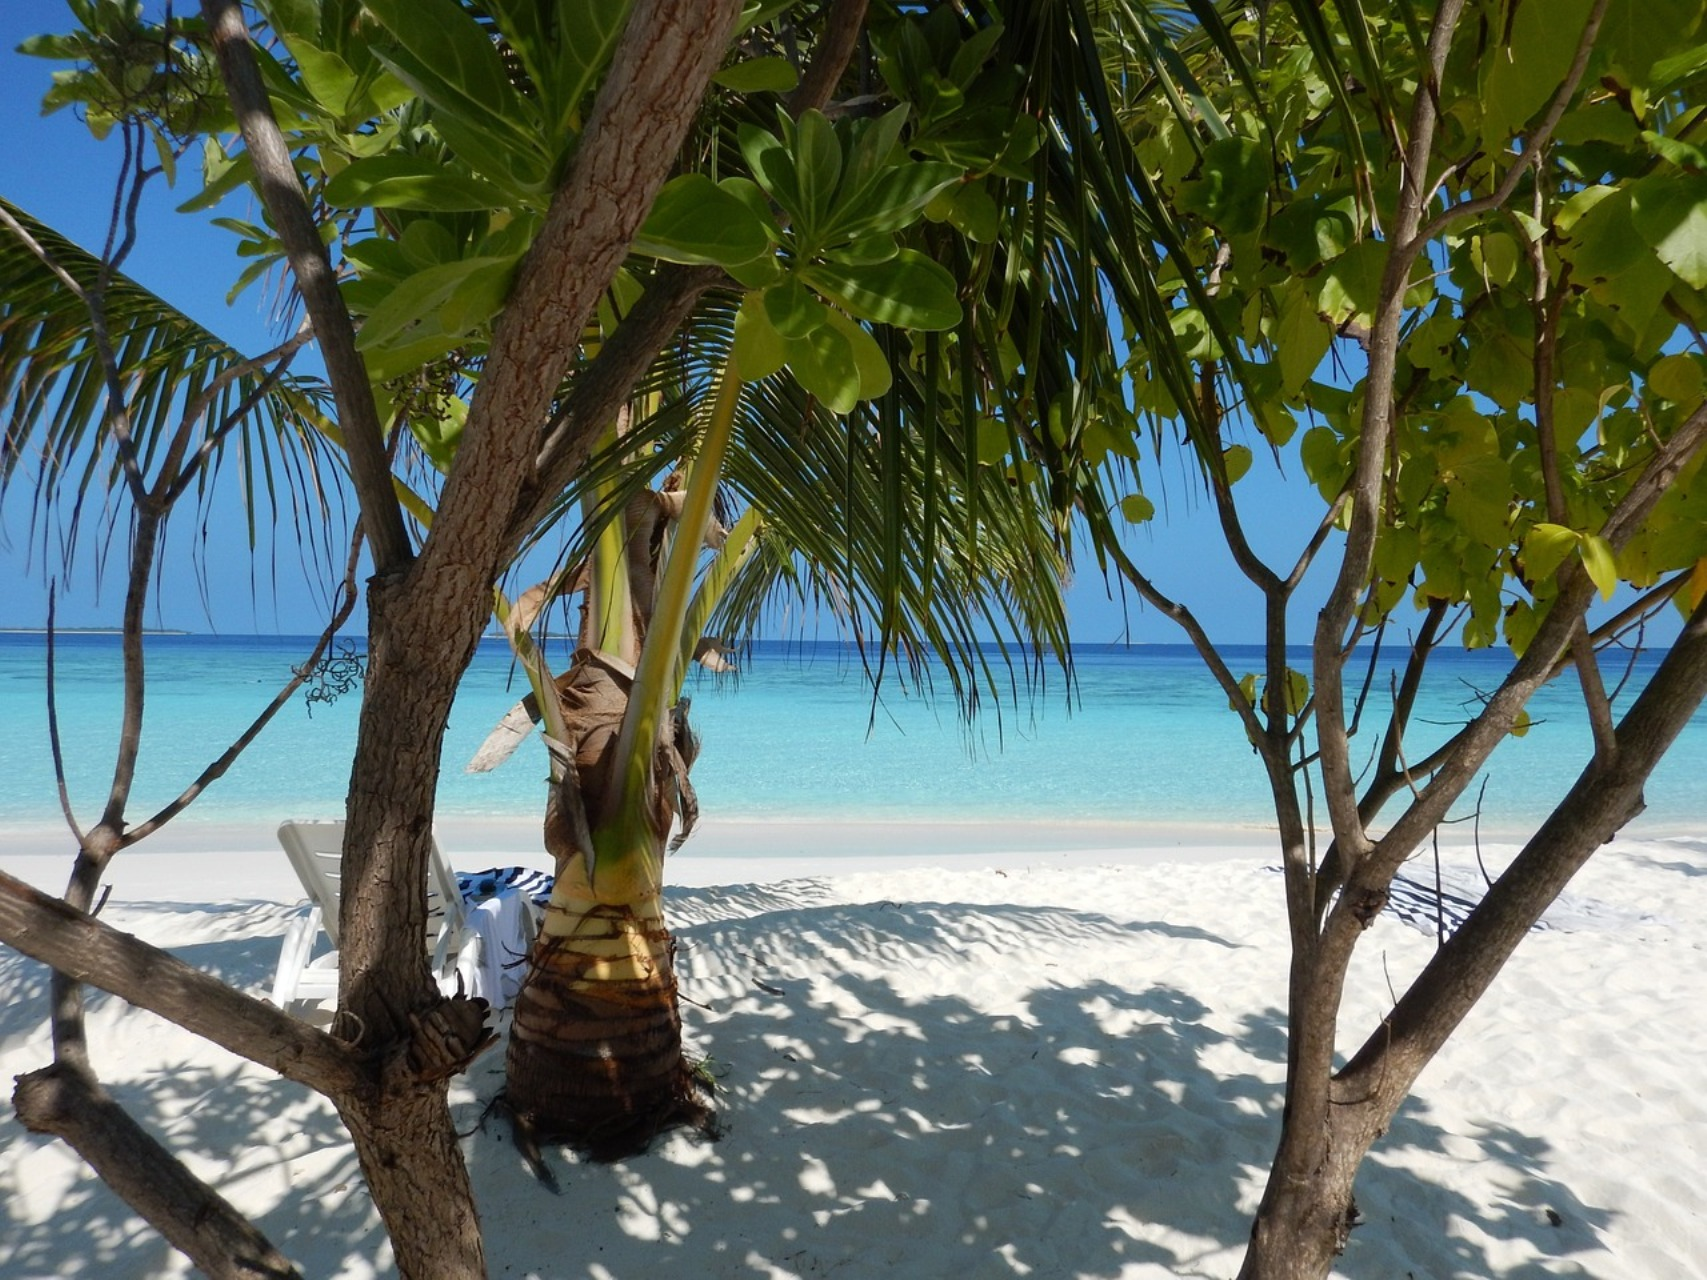 Karibik Südsee Malediven Samoa Hawaii Asien Thailand Tehighland Bangkok Bang Monument Valley die reise reisen bielefeld reisebuero Wellnessreisen Familienreisen Kreuzfahrten Lastminute Mietwagen Lastminute